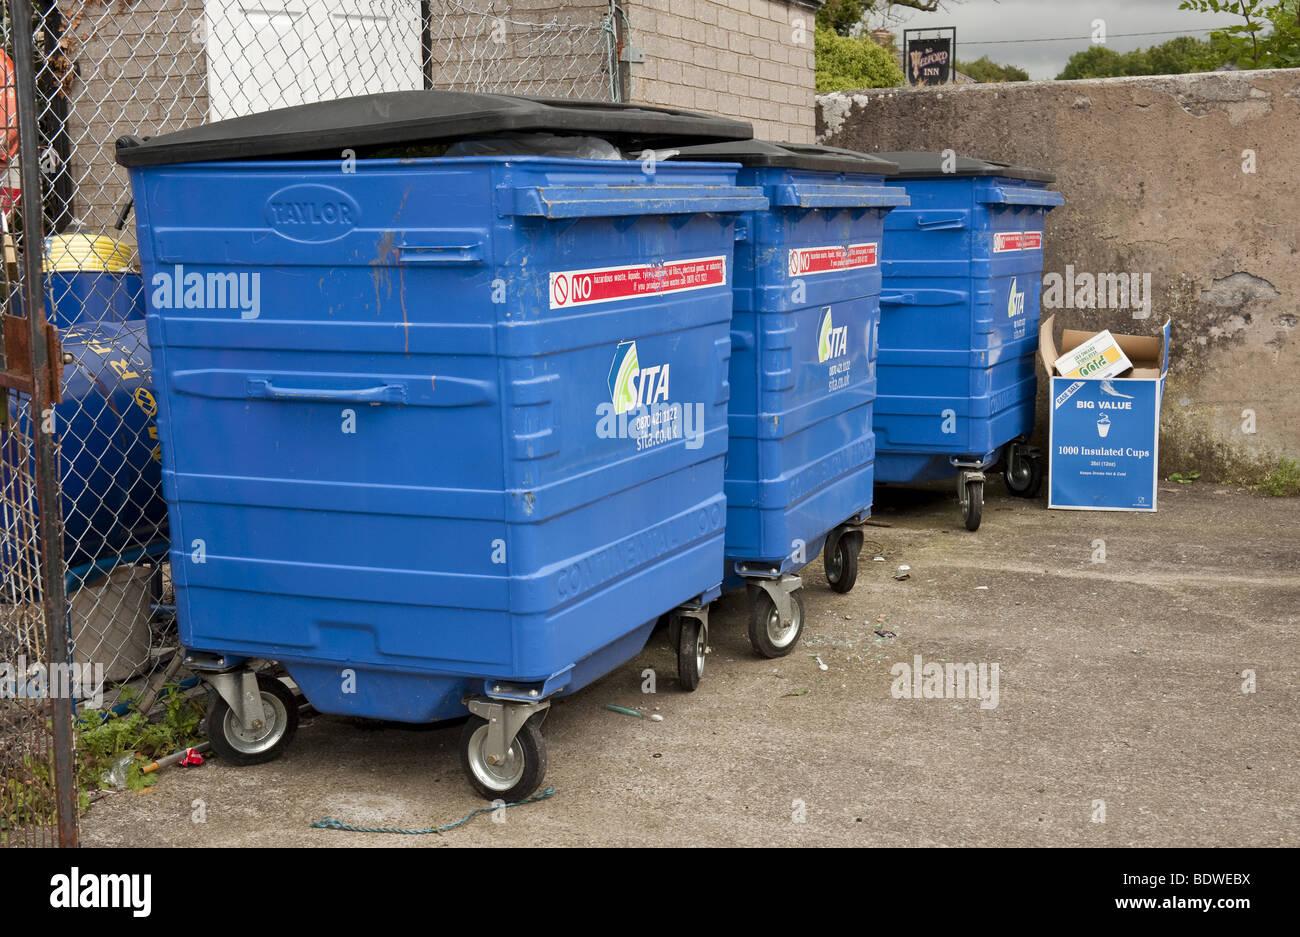 Three Large Blue Plastic Commercial Wheelie Bins Full Of